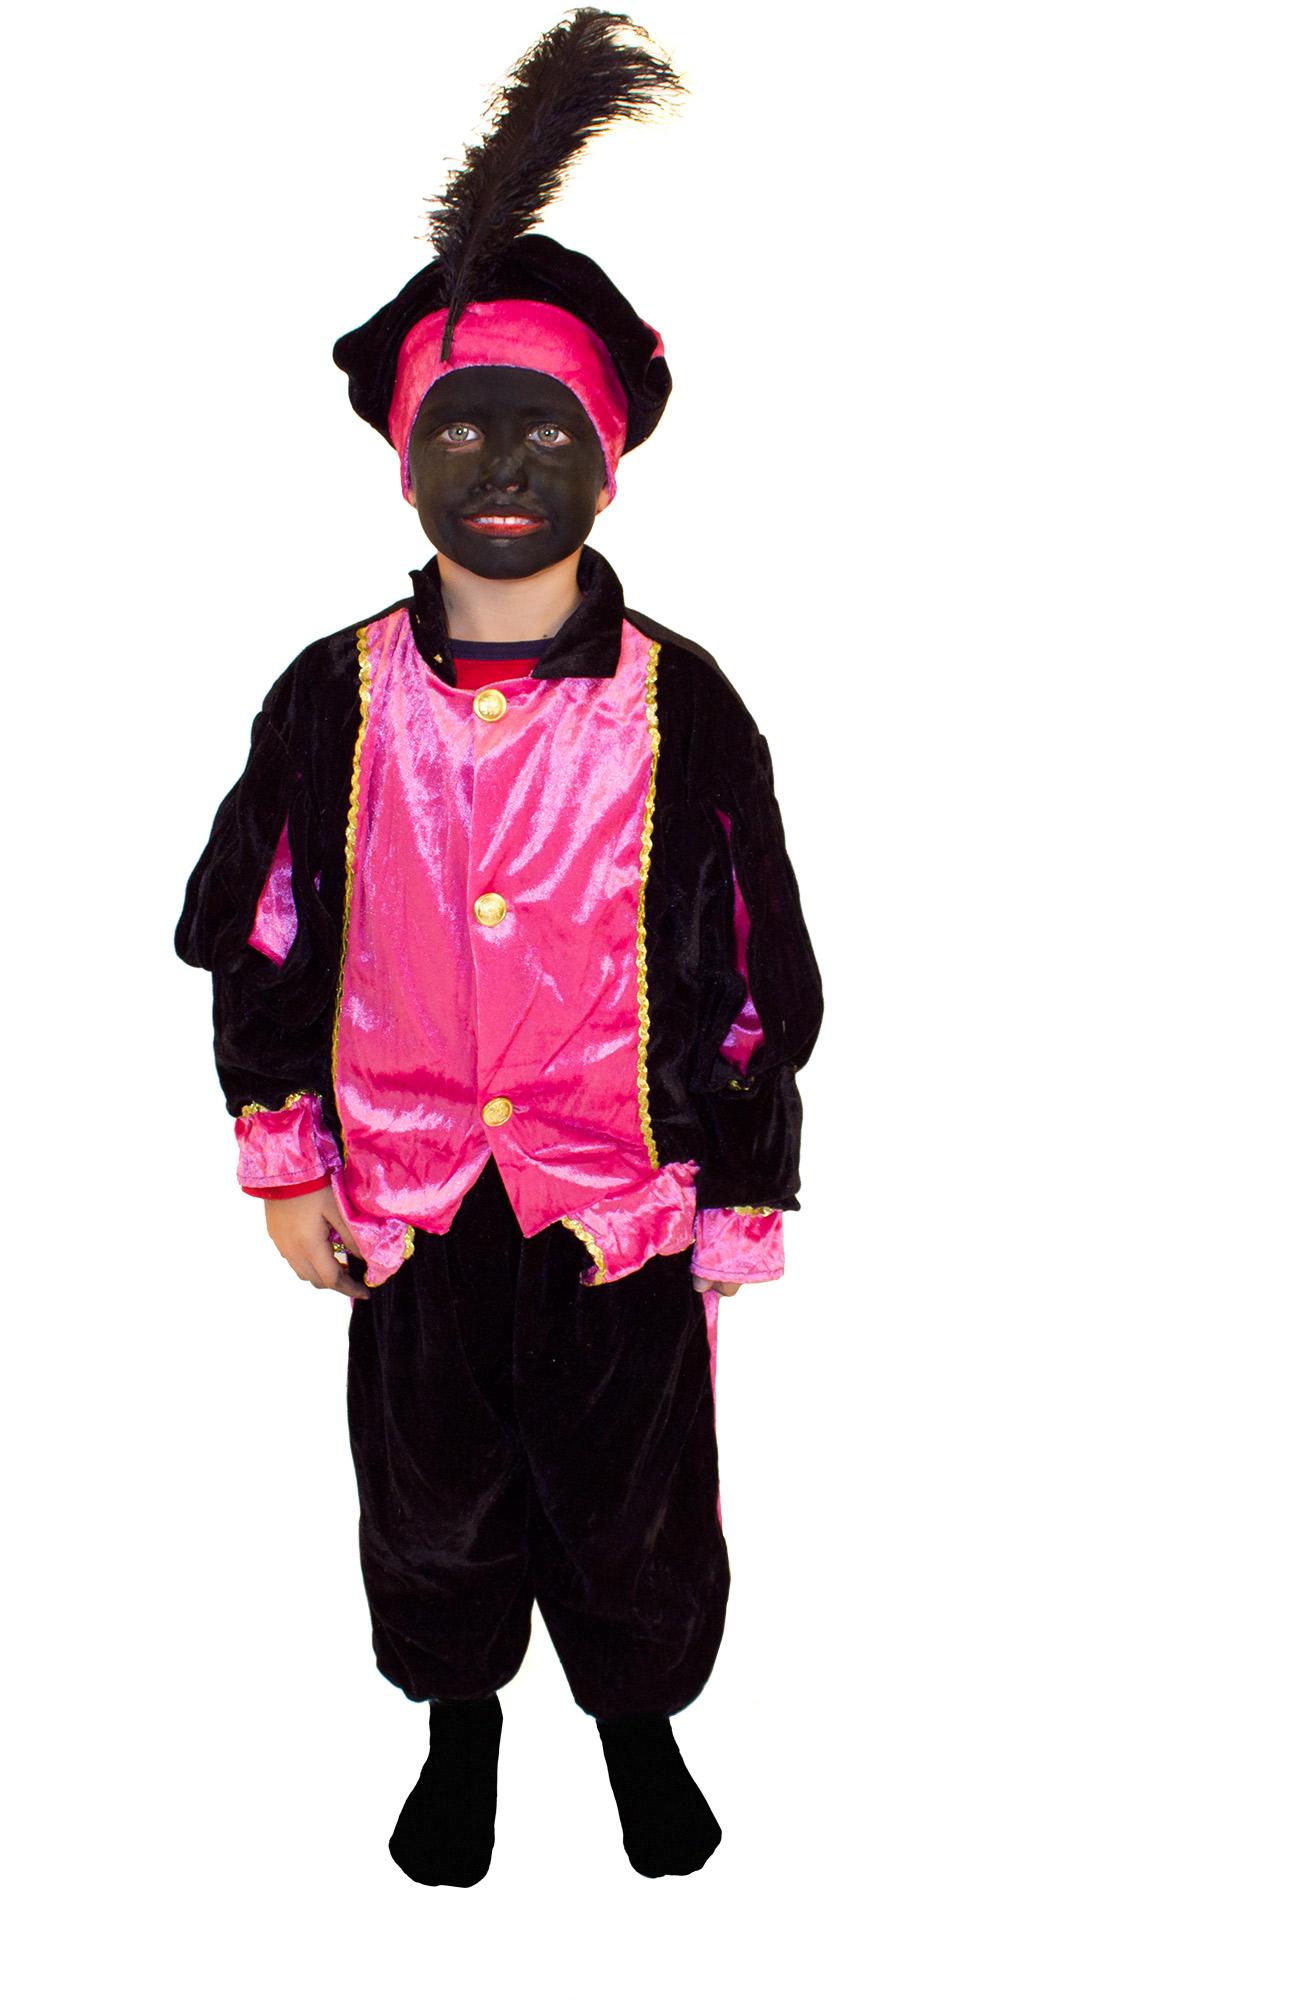 knecht ruprecht verkleidung rosa f r kinder kost me f r kinder und g nstige faschingskost me. Black Bedroom Furniture Sets. Home Design Ideas